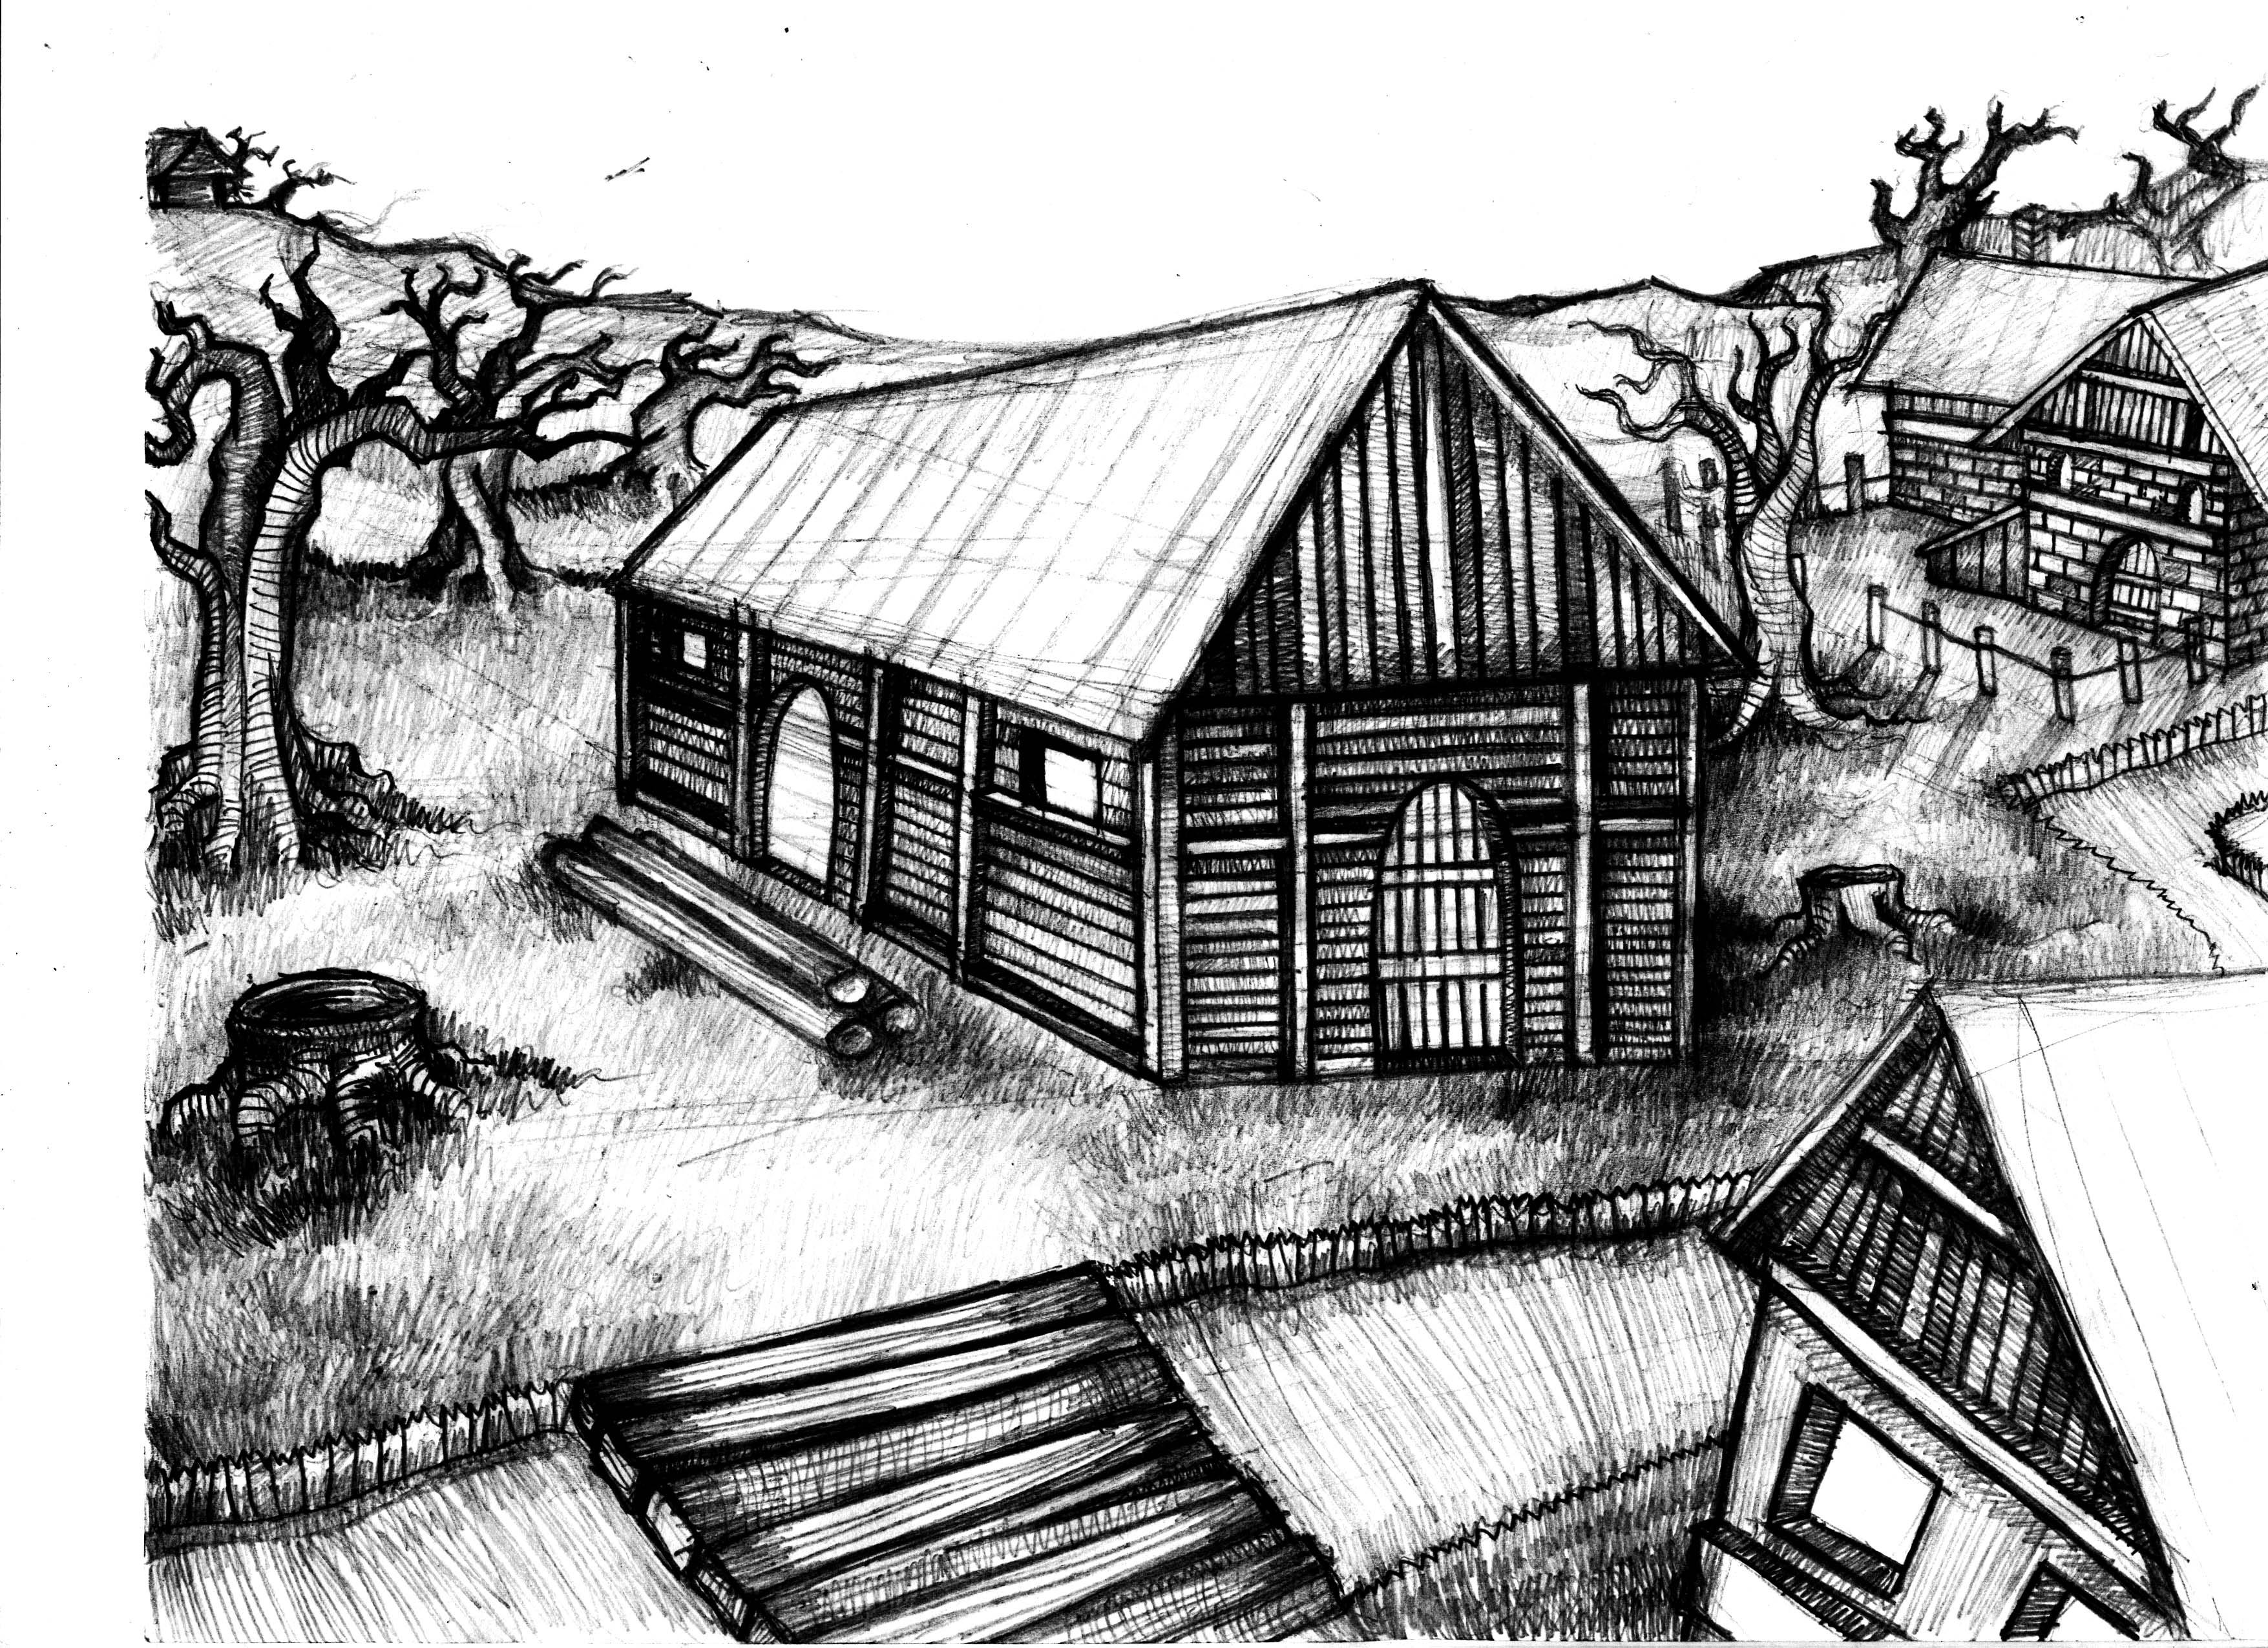 description of village